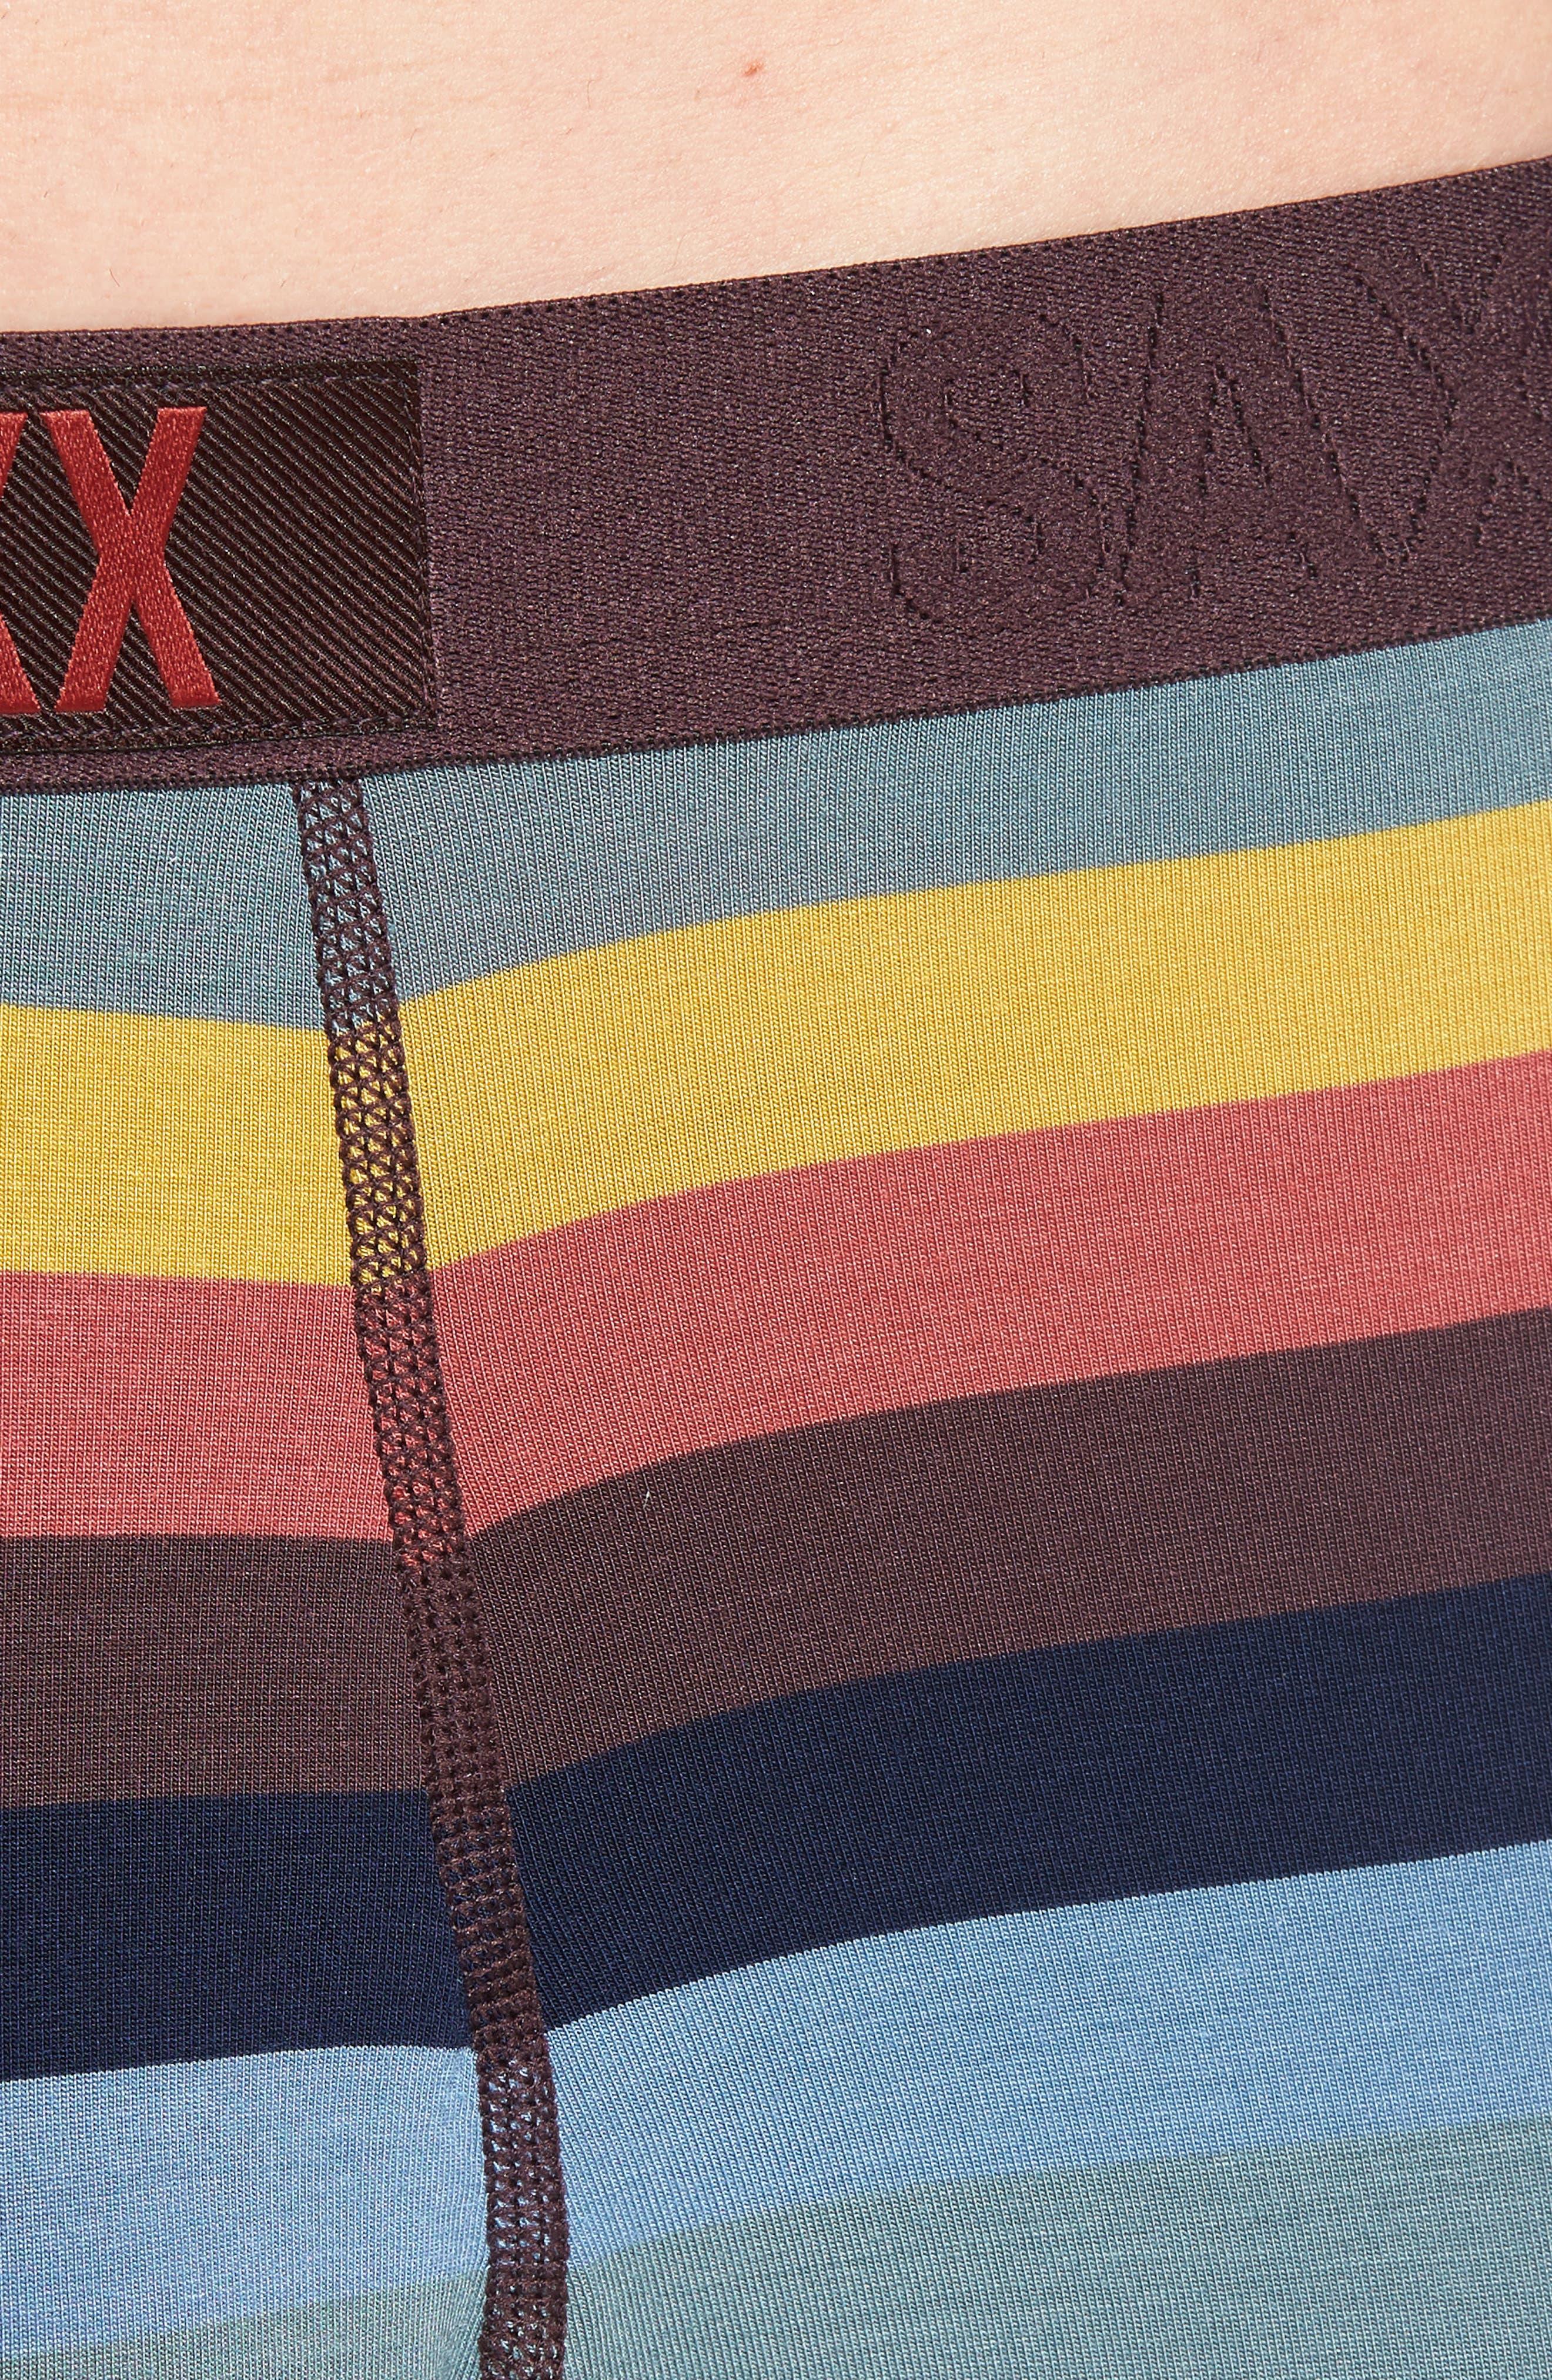 Ultra Stretch Boxer Briefs,                             Alternate thumbnail 4, color,                             Cabana Stripe